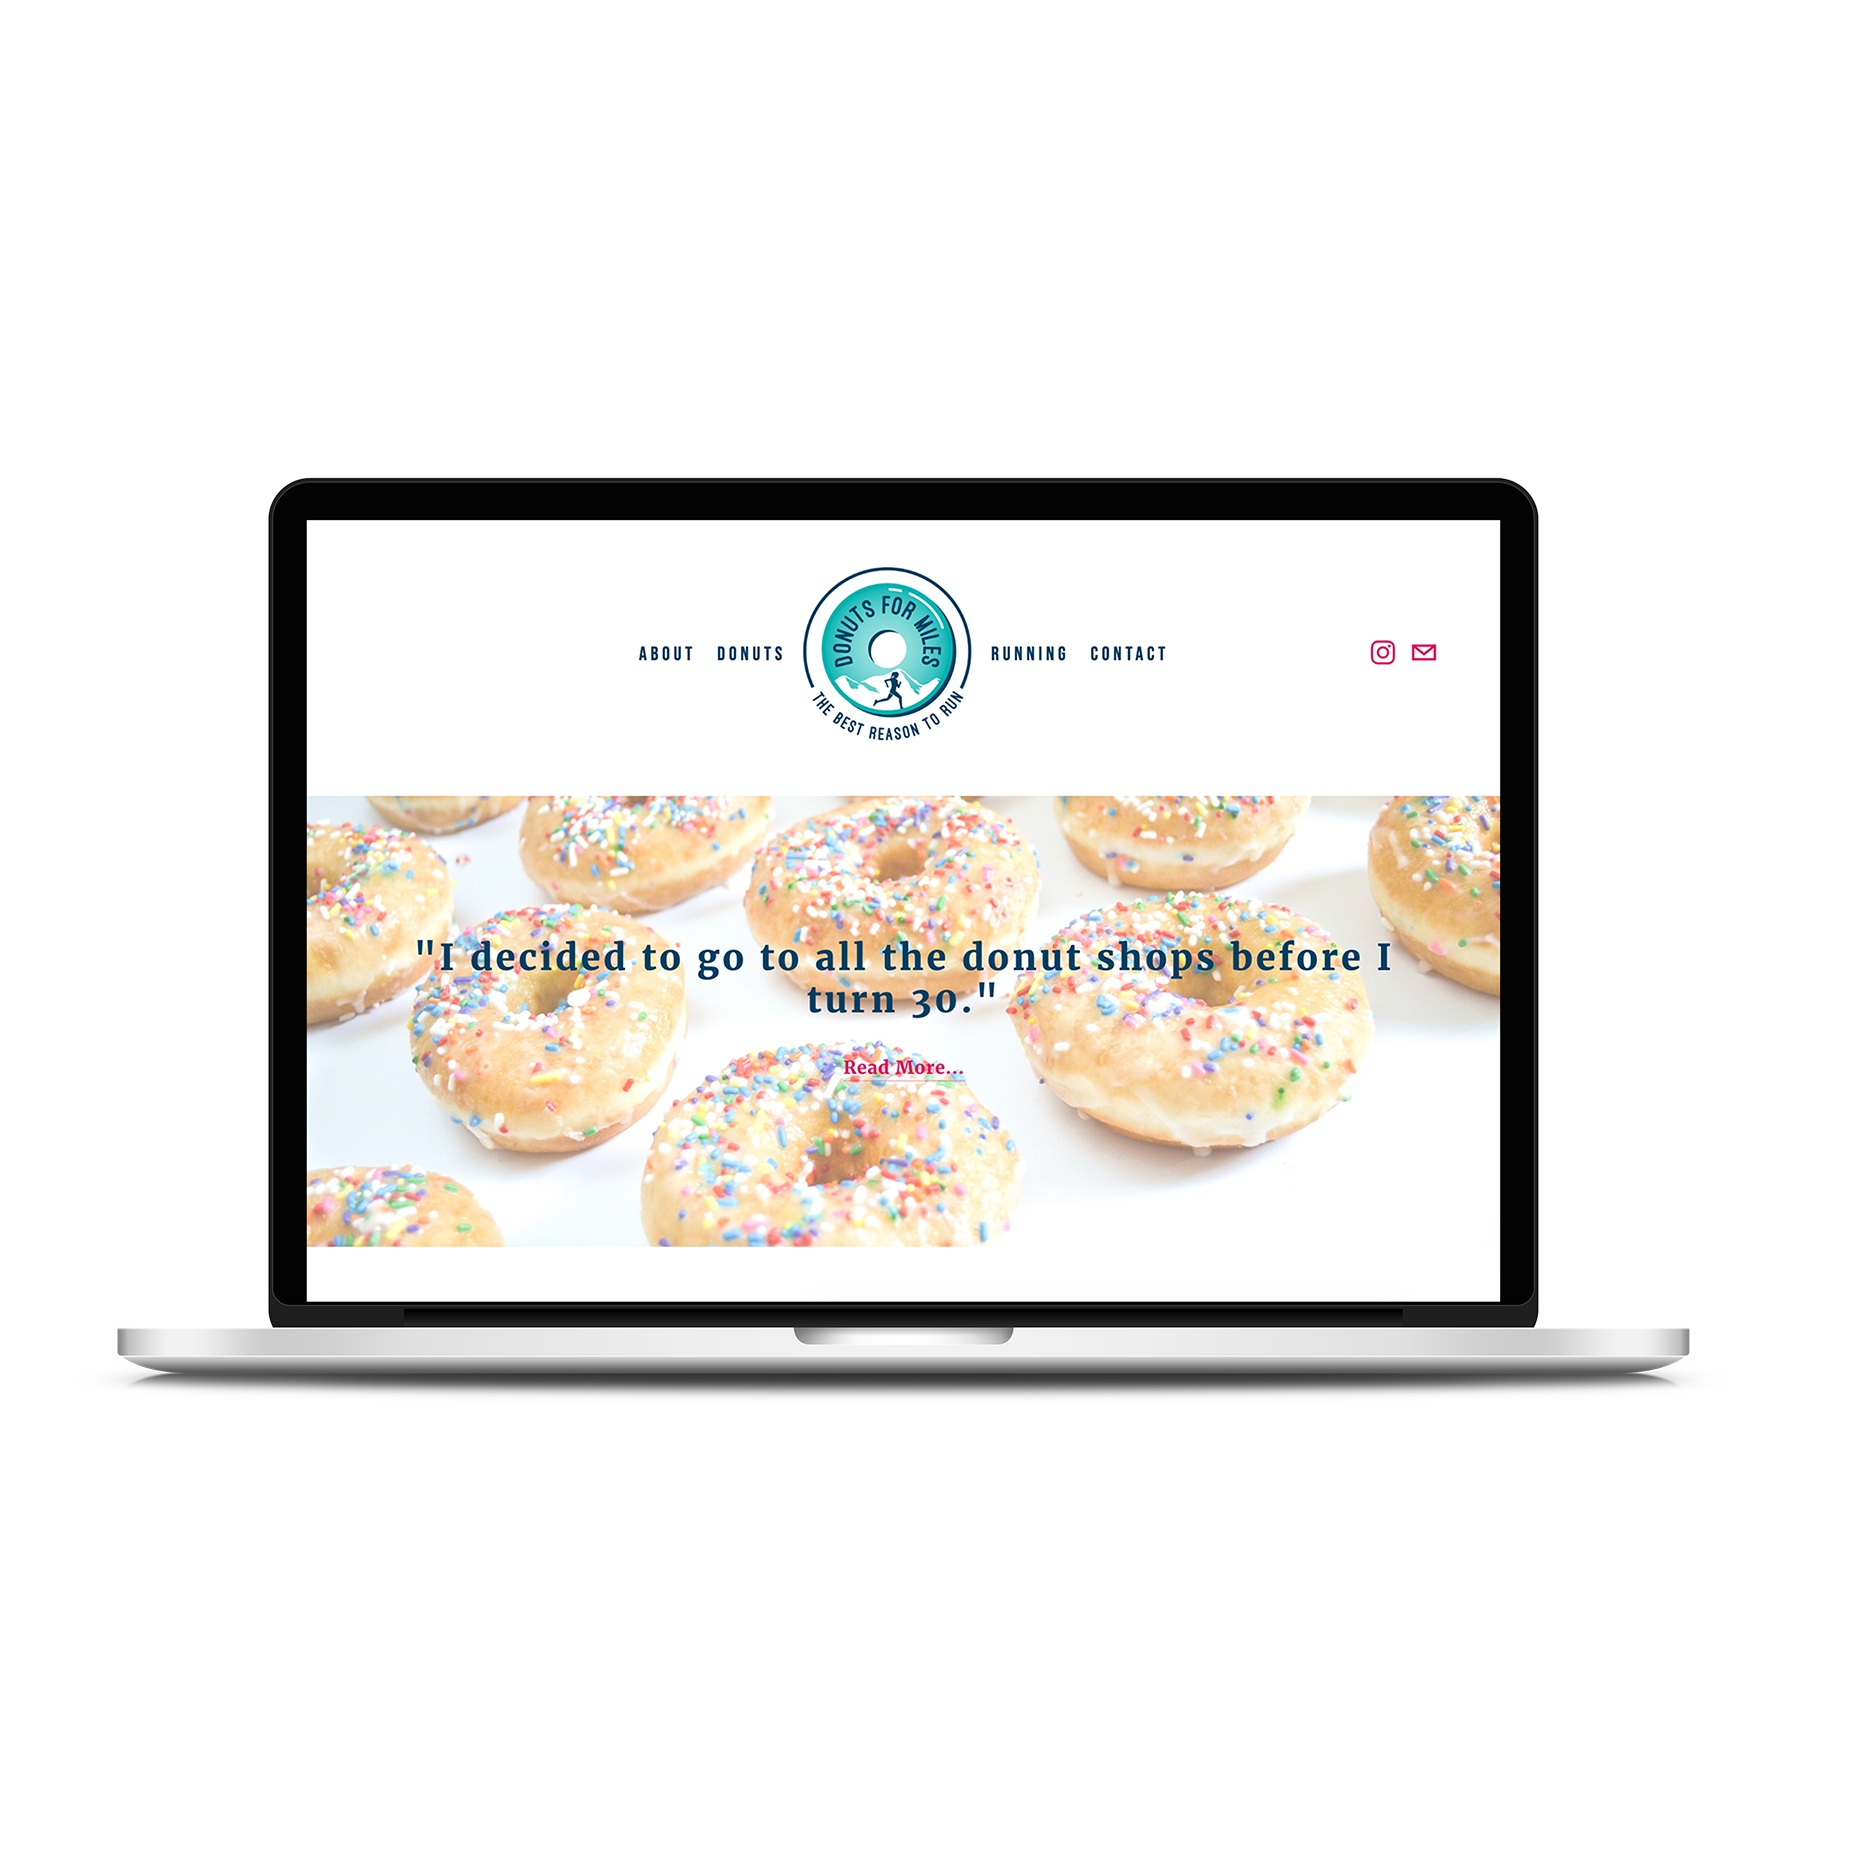 Donuts_Laptop MockupSQUARE3.png